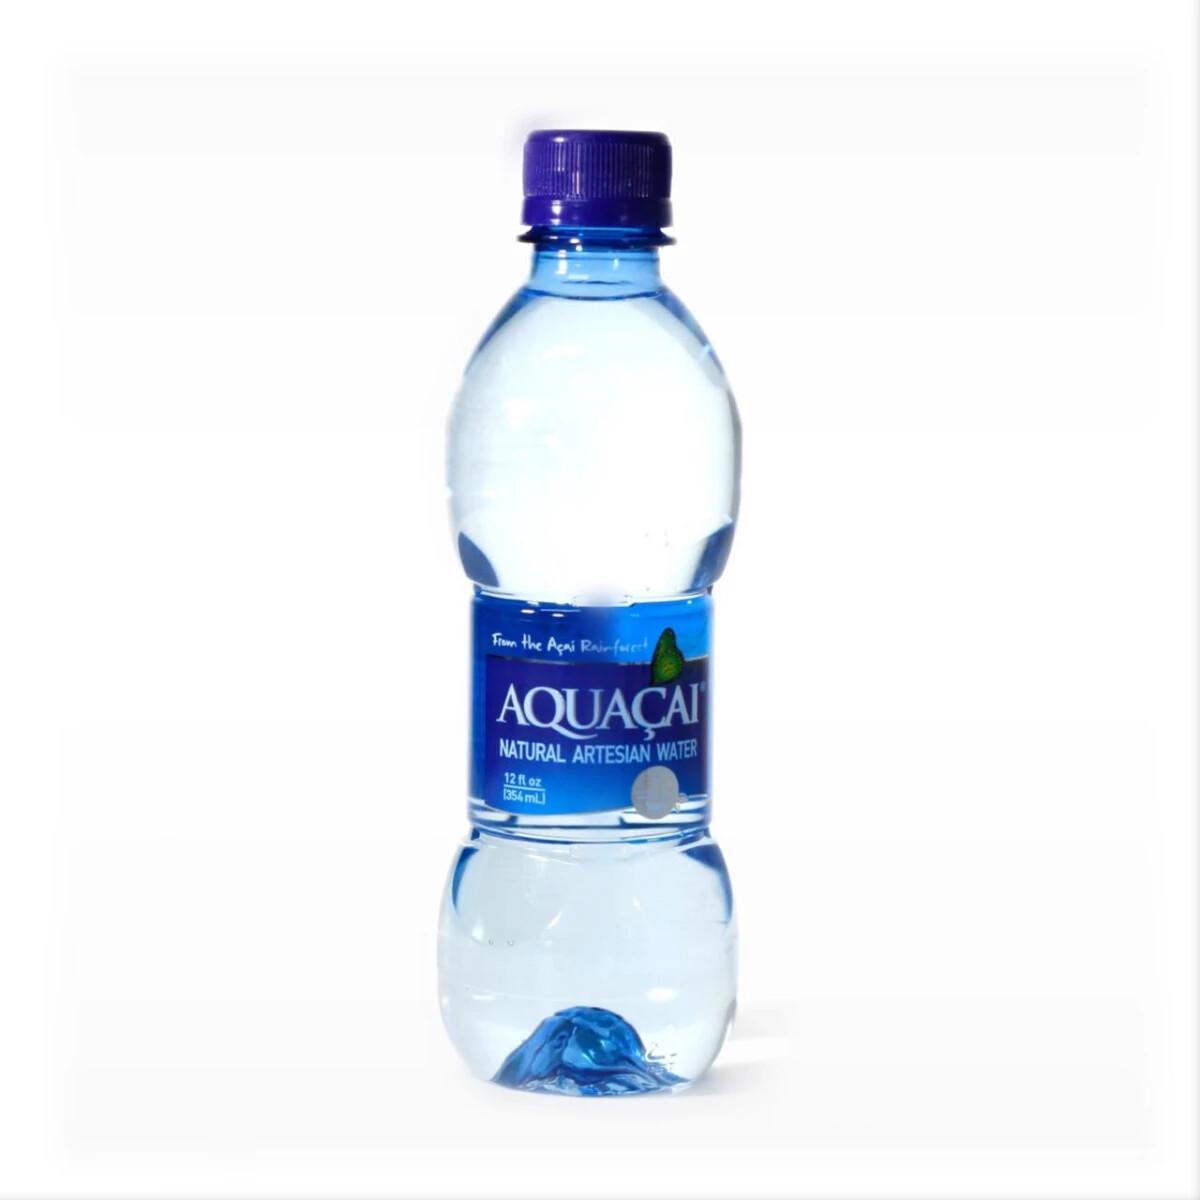 AGUA AQUACAI NATURAL ARTESIAN WATER 12oz